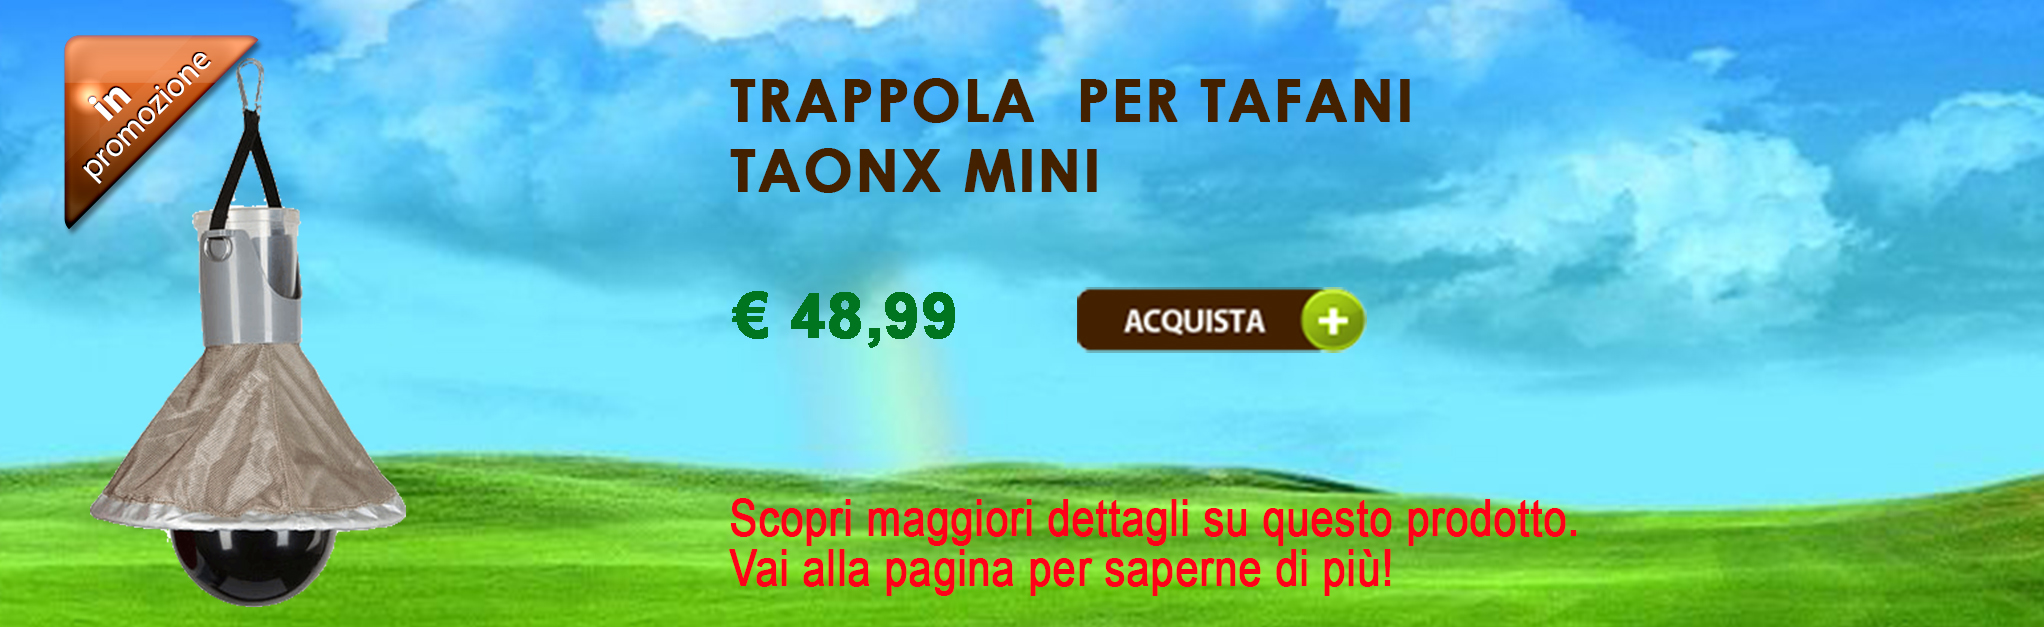 Trappola per tafani TaonX  Mini